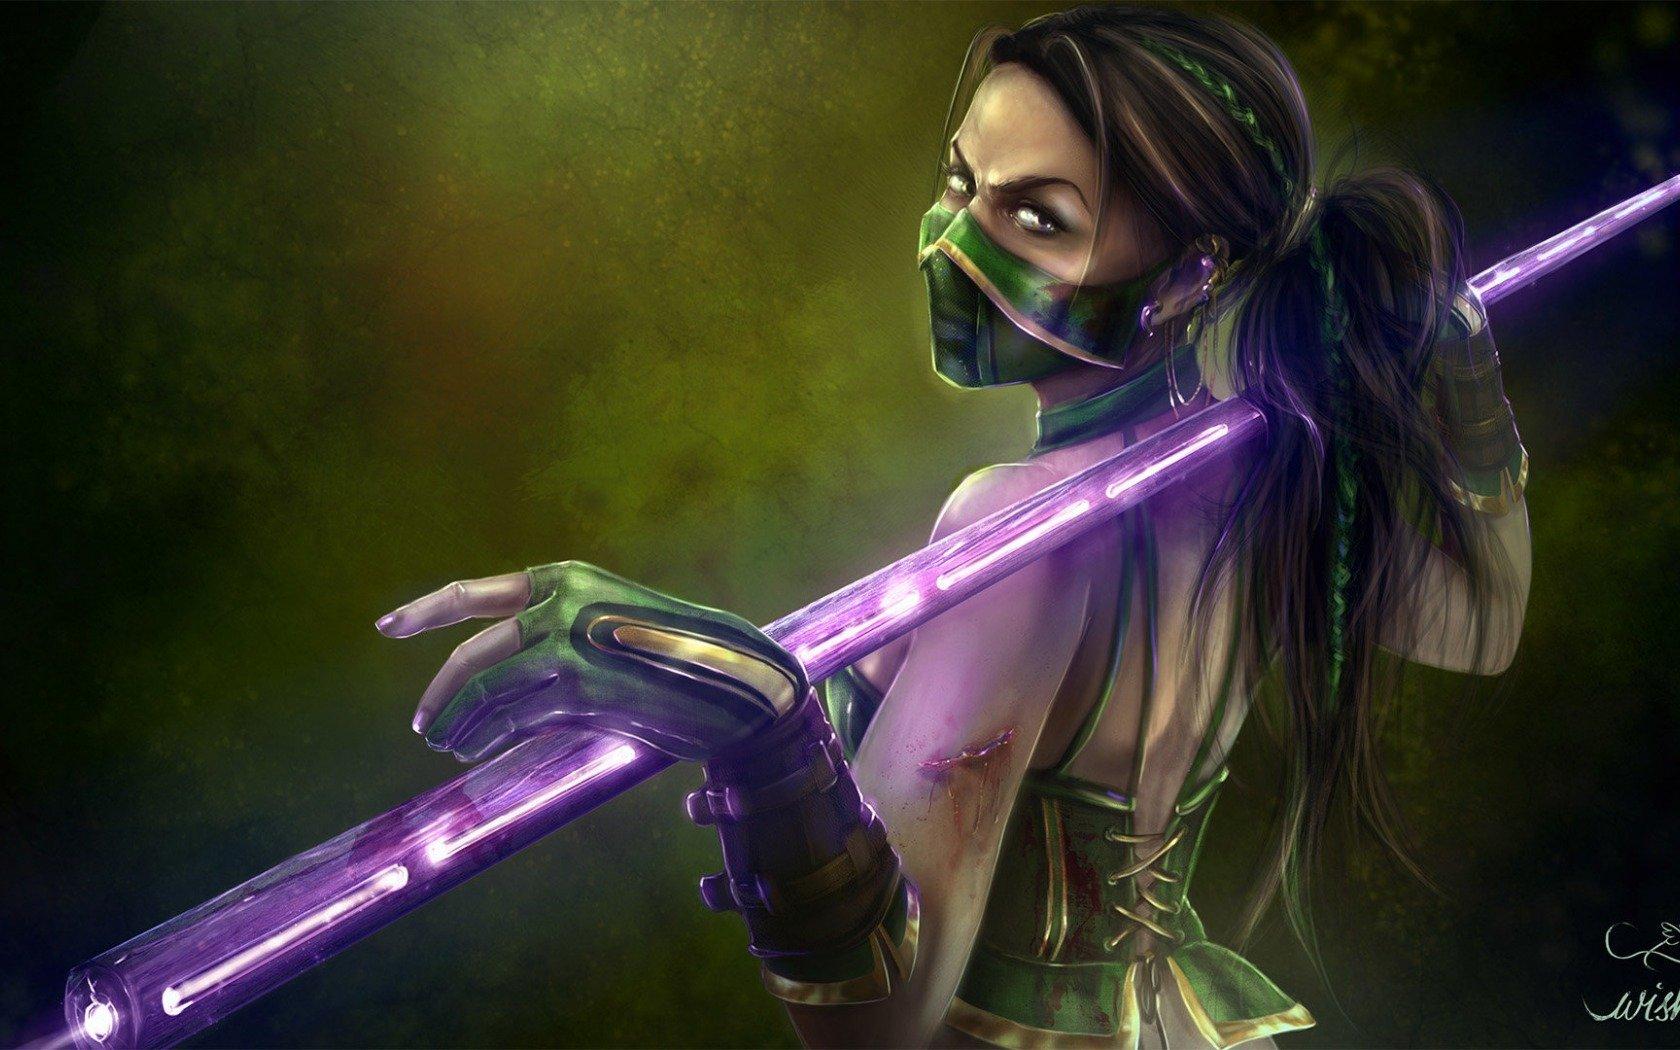 Mortal kombat Jade wallpaper | 1680x1050 | 706653 ...